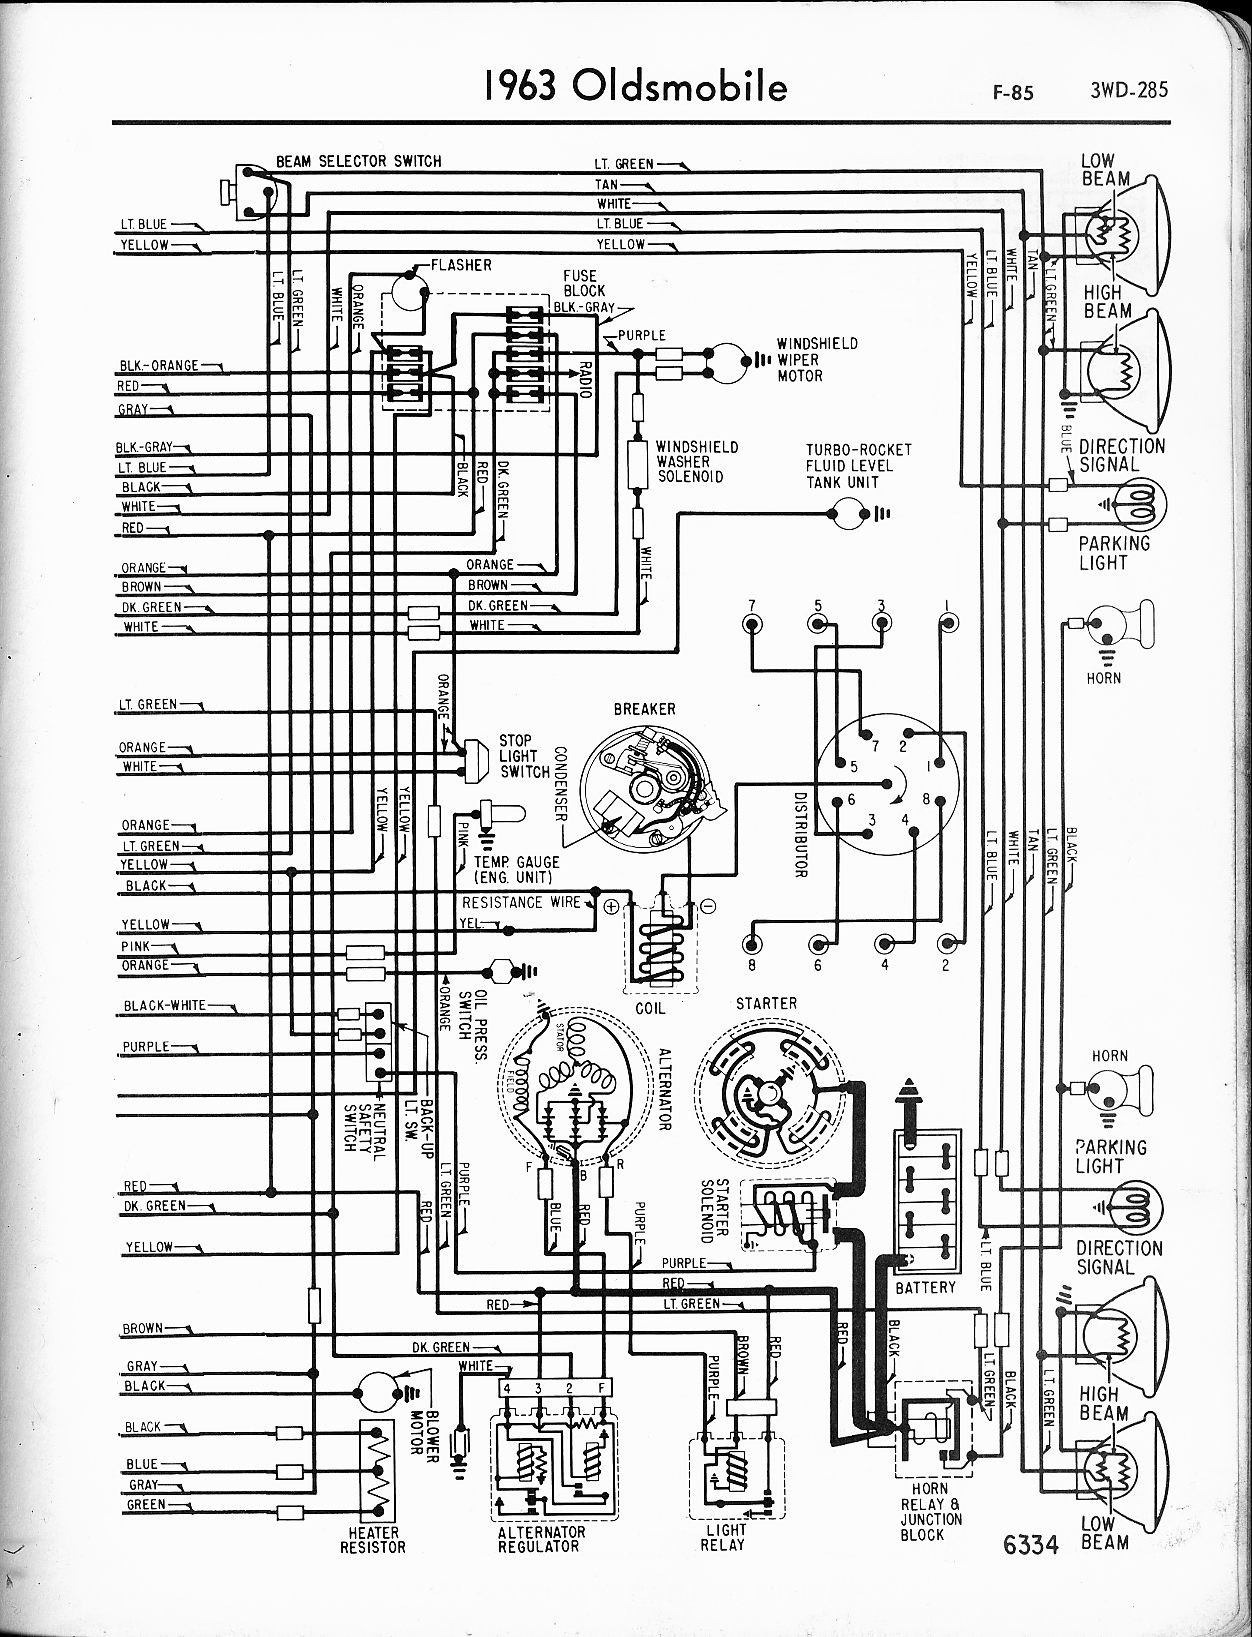 1991 gmc sonoma radio wiring diagram xmtd temperature controller 1994 oldsmobile cutl ciera